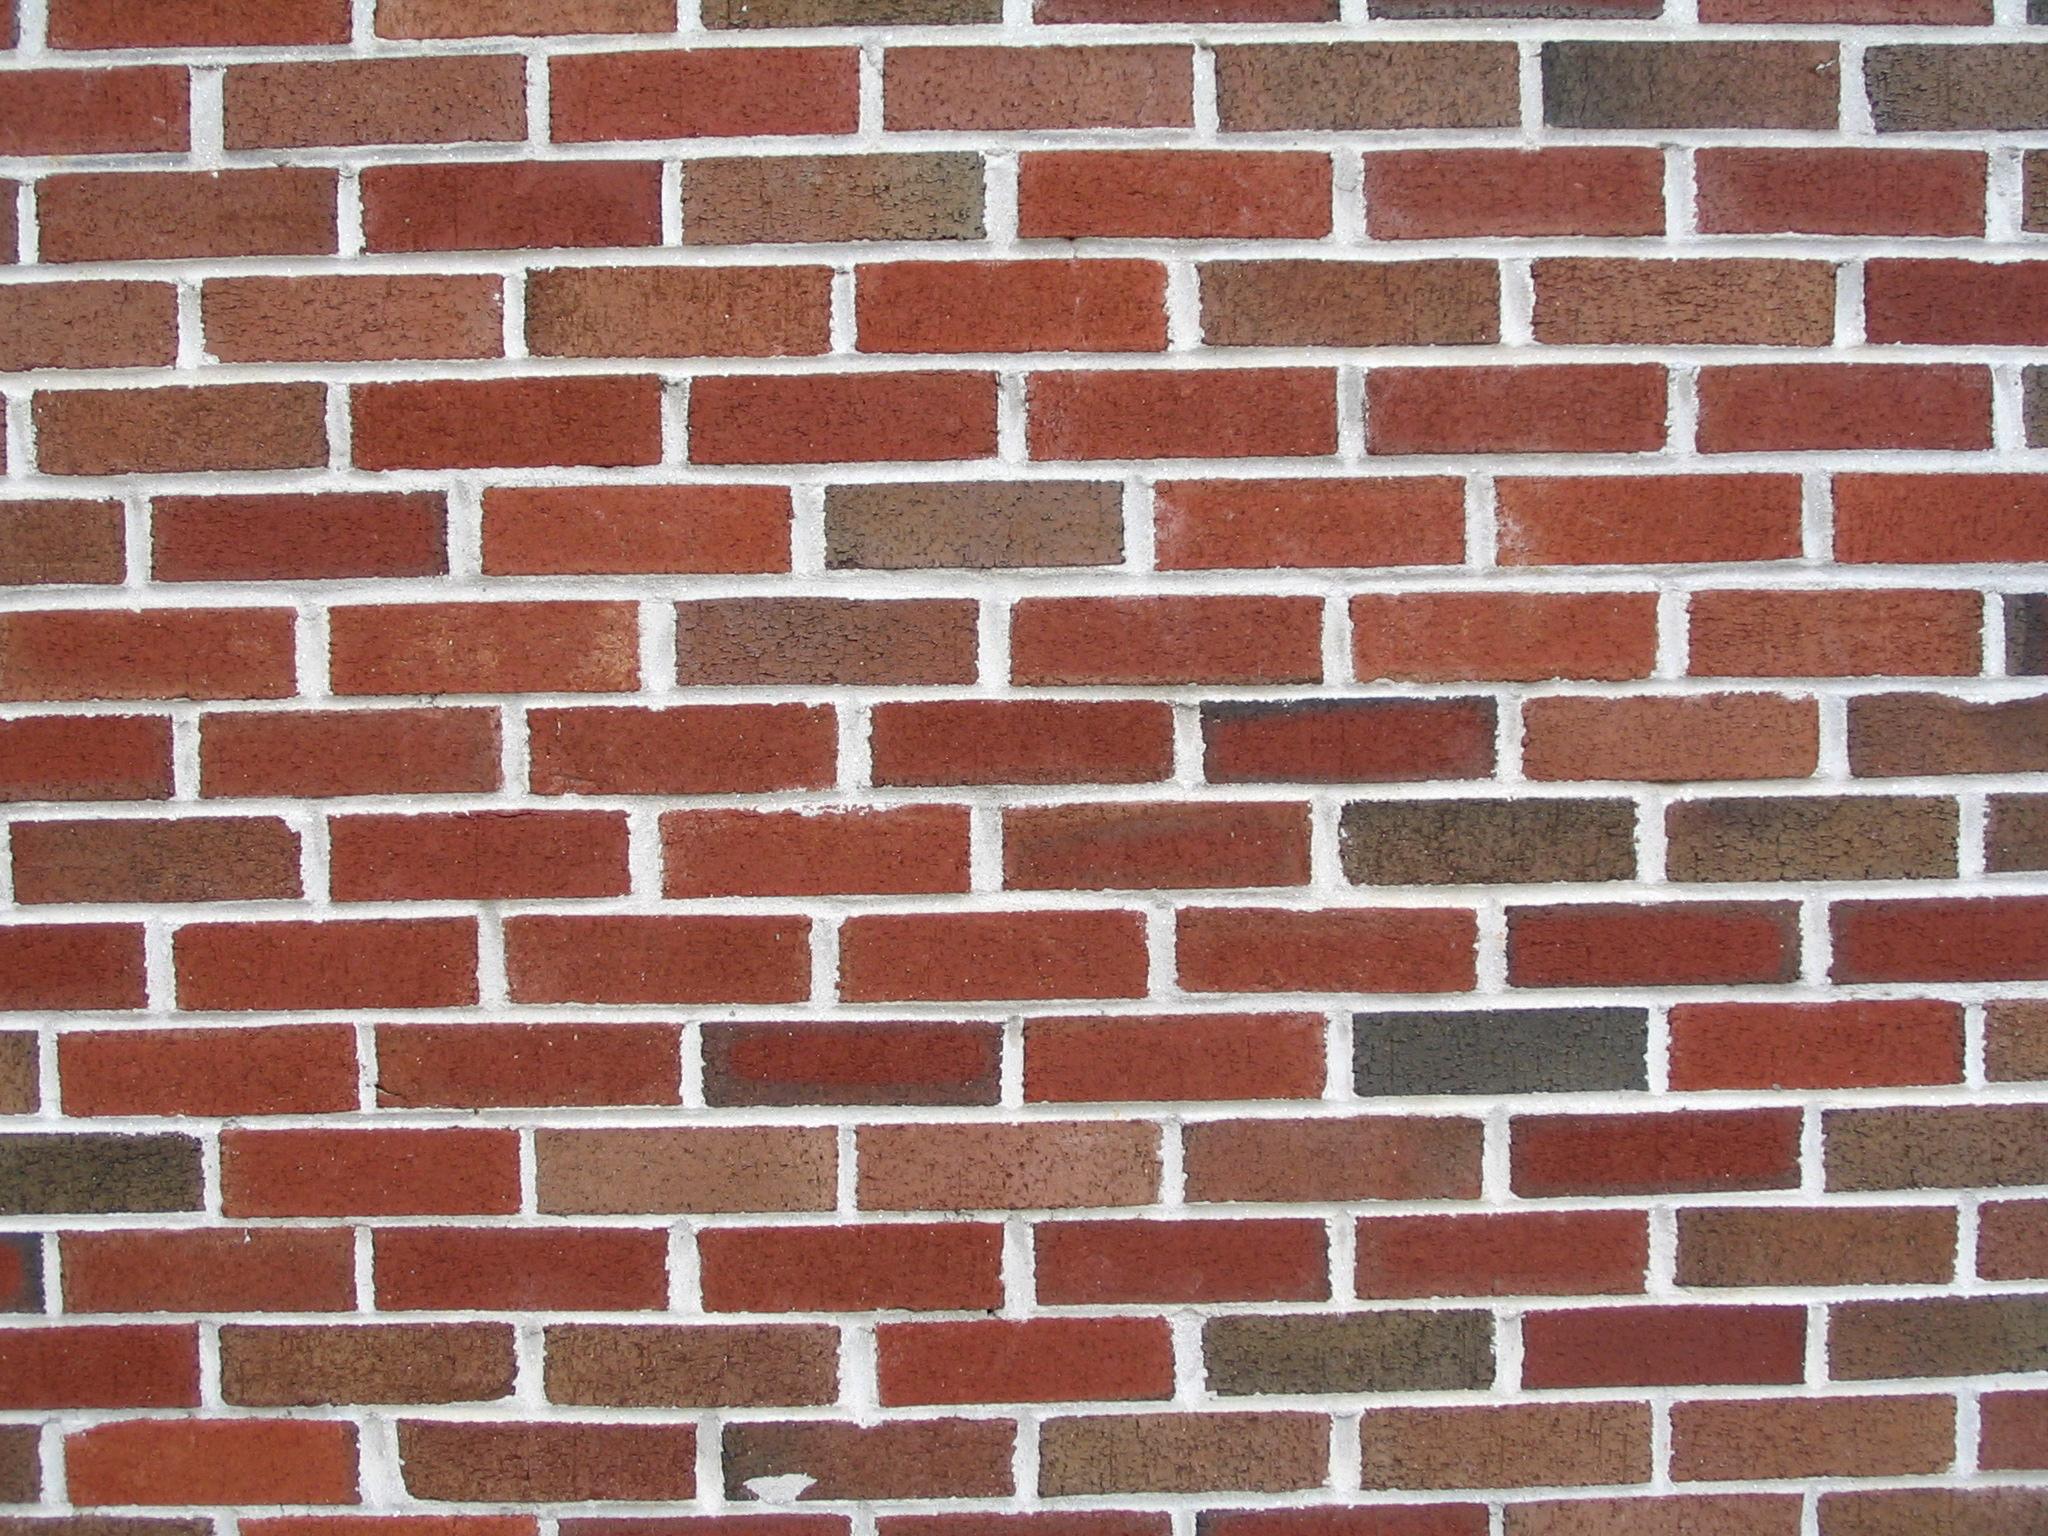 brick, кирпичи, стена, фон, текстура, скачать